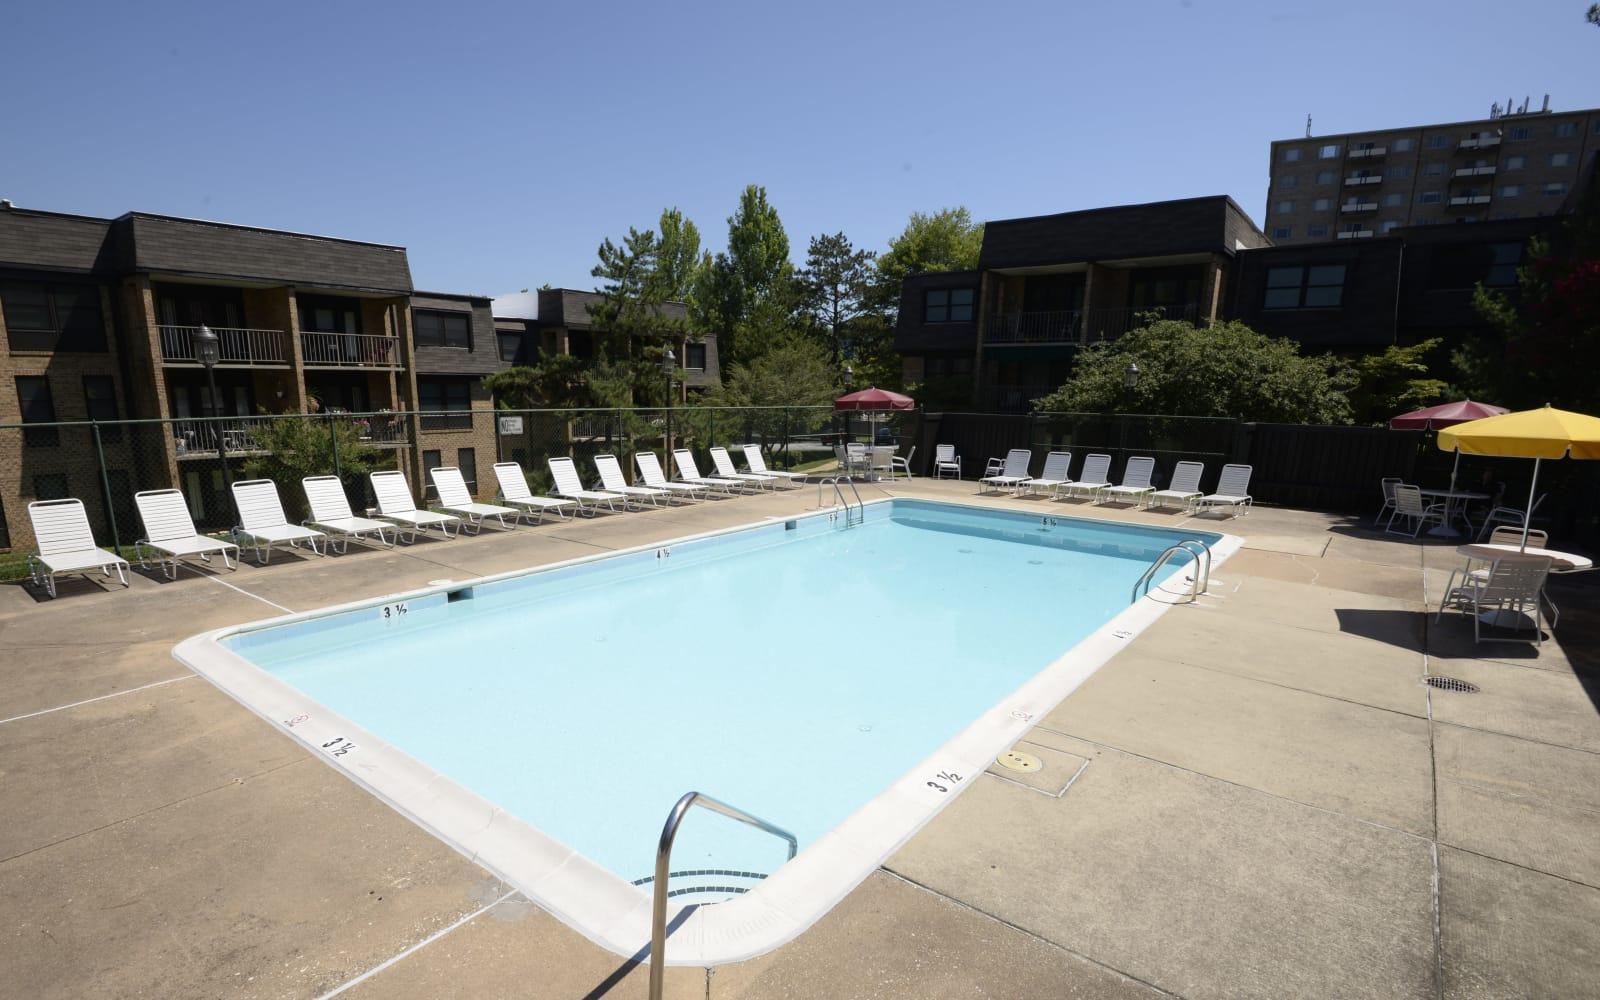 Beautiful swimming pool at Charlesgate Apartments in Towson, Maryland